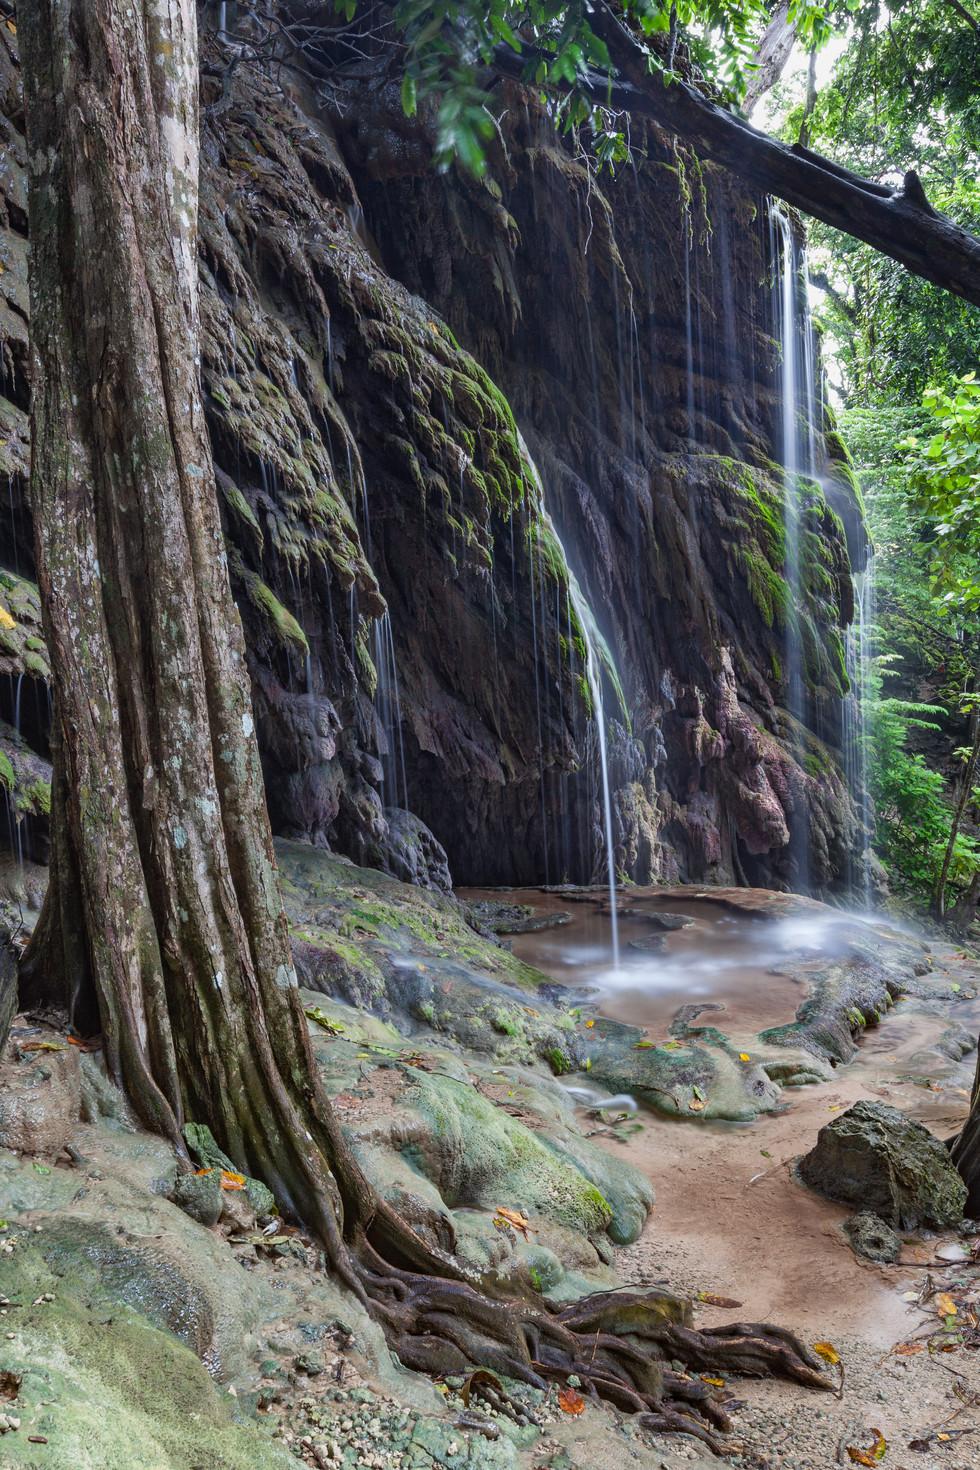 Hug's Dale Waterfall